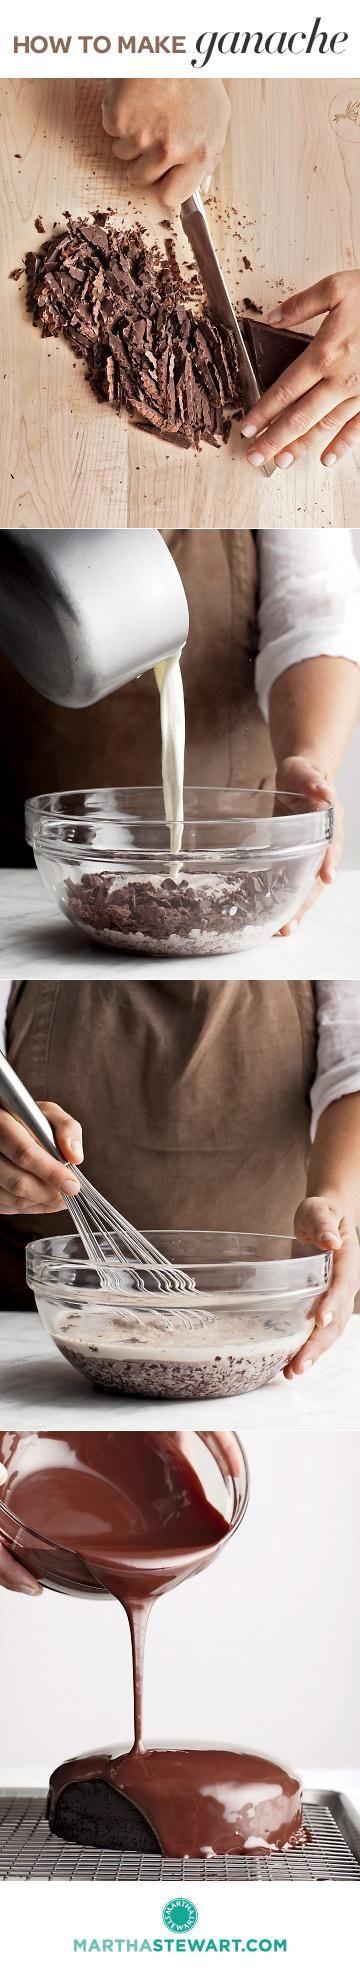 Ganache.  A no-fail recipe plus inspiring ideas to use this heavenly chocolate treat.  http://www.marthastewart.com/874691/ganache-101/@Virginia Kraljevic Stokes/874882/chocolate-recipes?xsc=pin_ms_baking_ganache